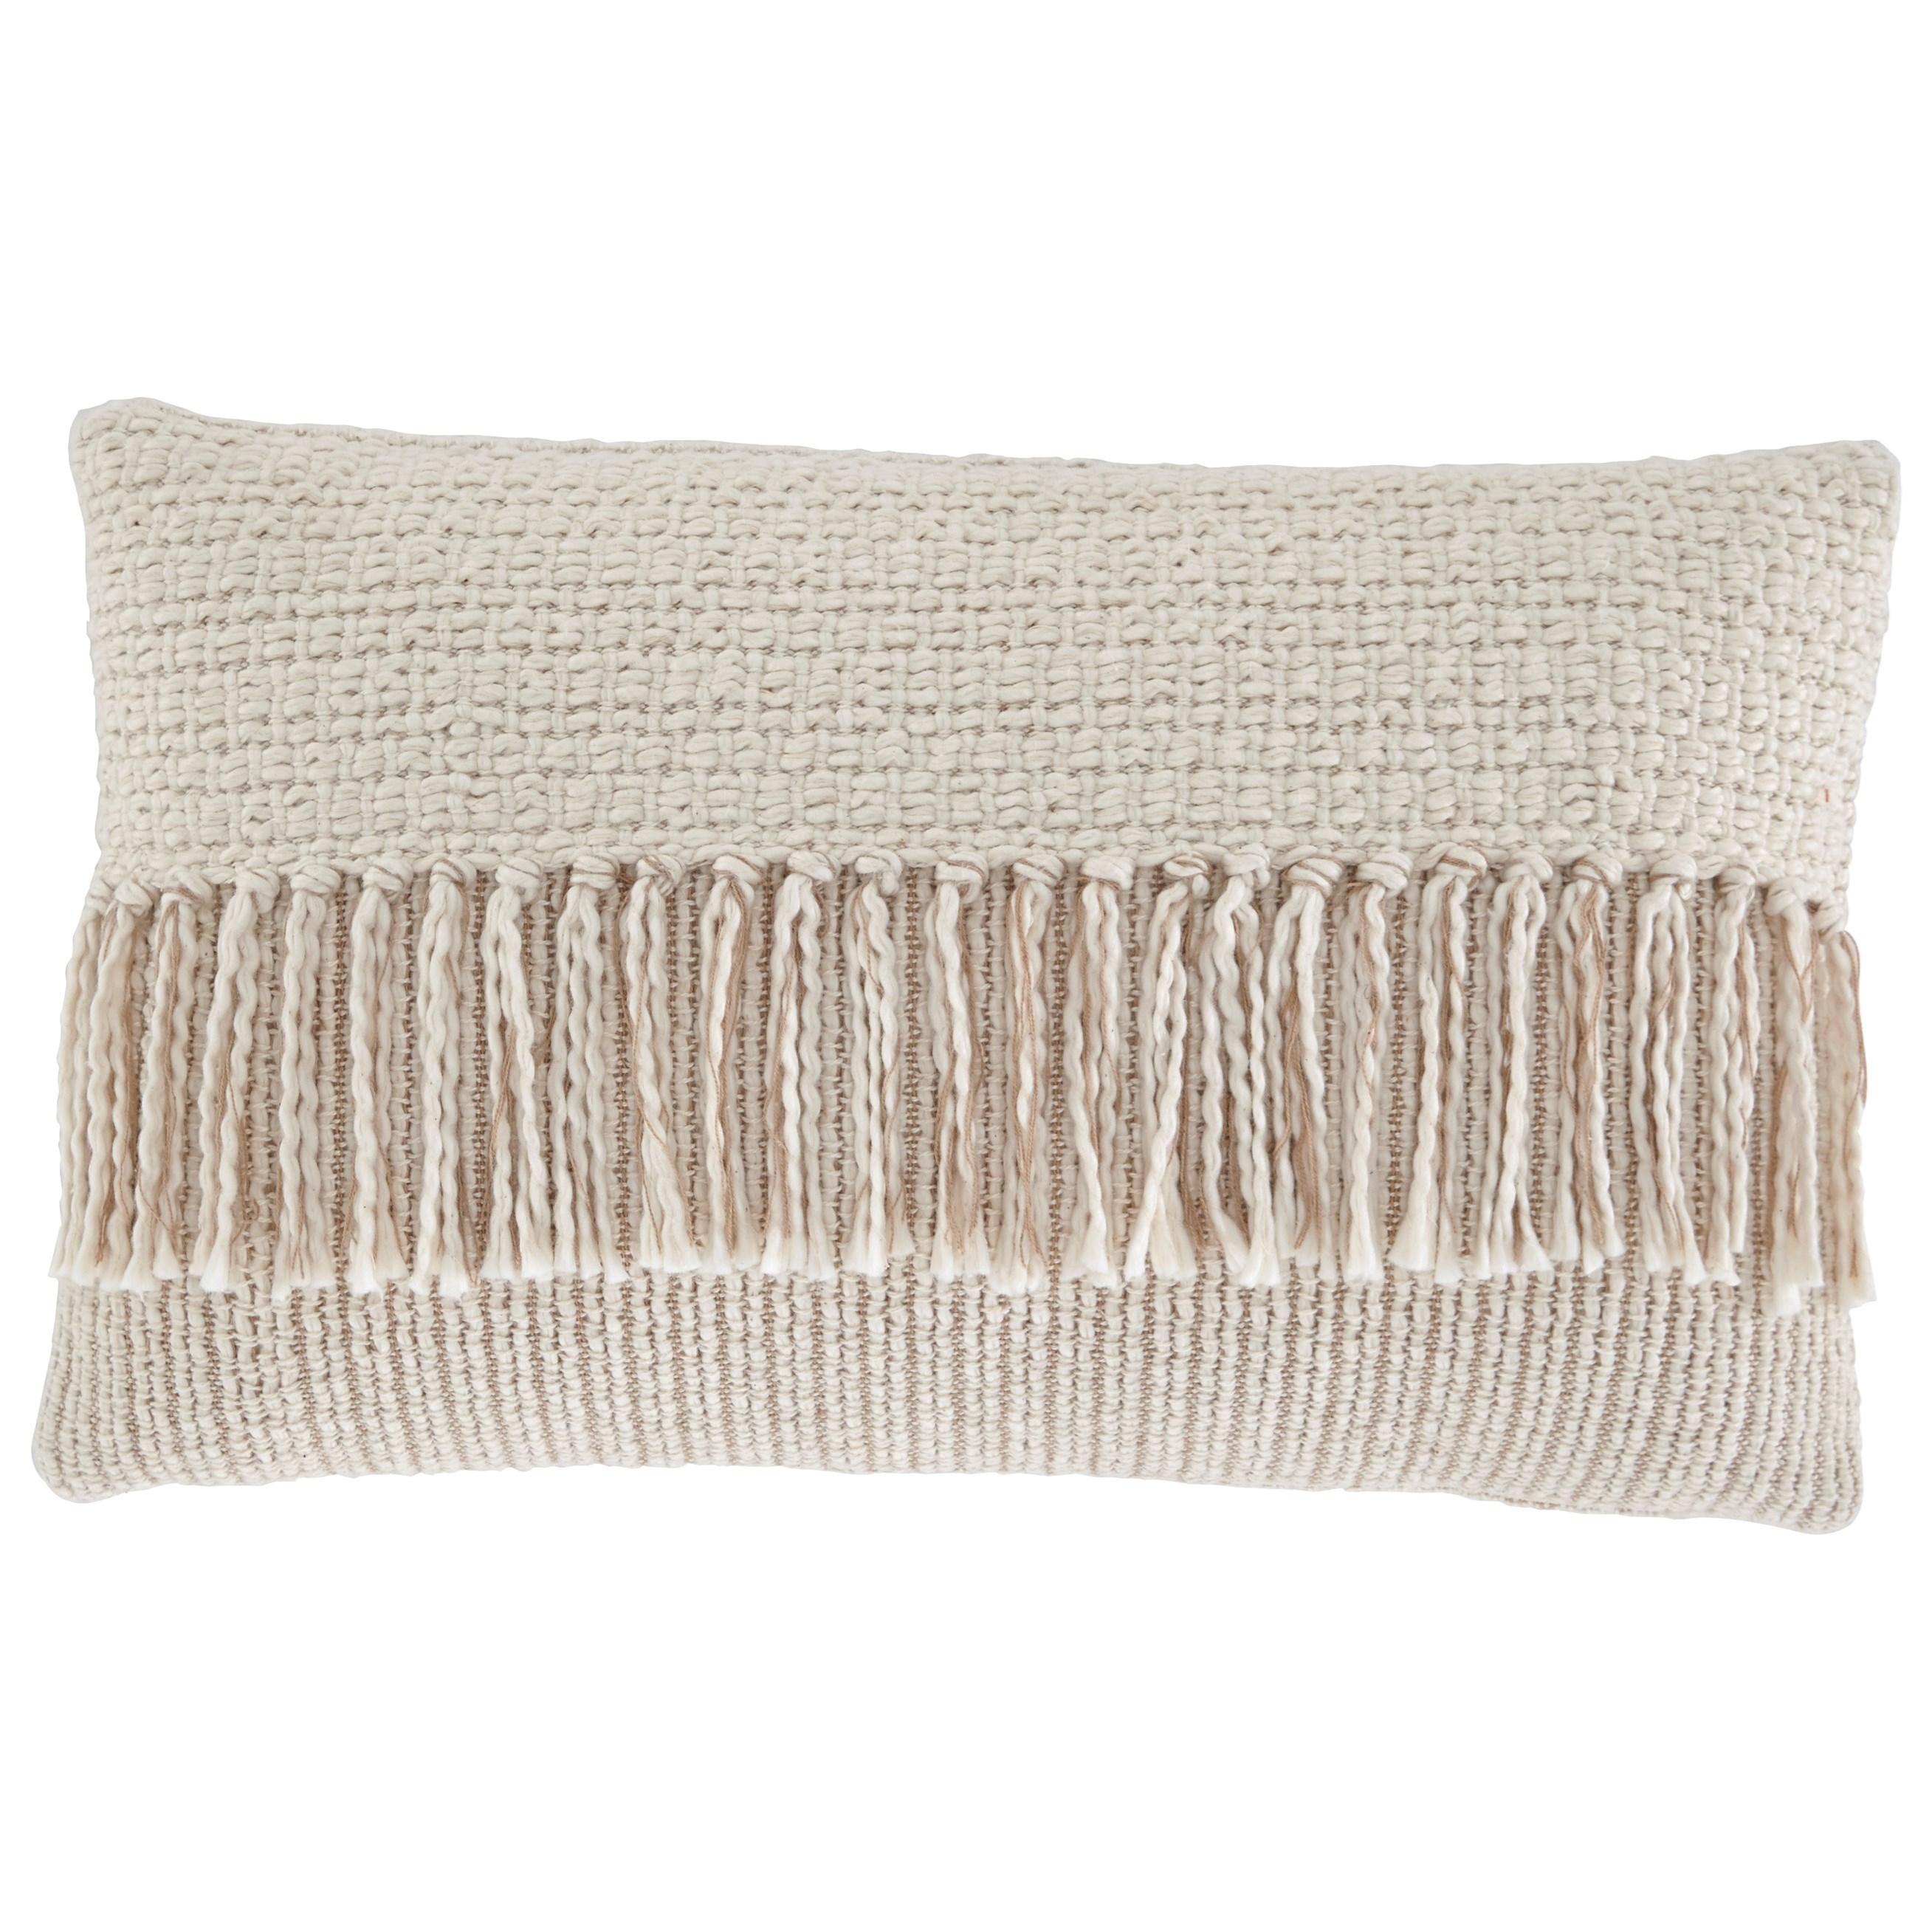 Signature Design by Ashley Pillows Medea Tan/Cream Pillow - Item Number: A1000565P